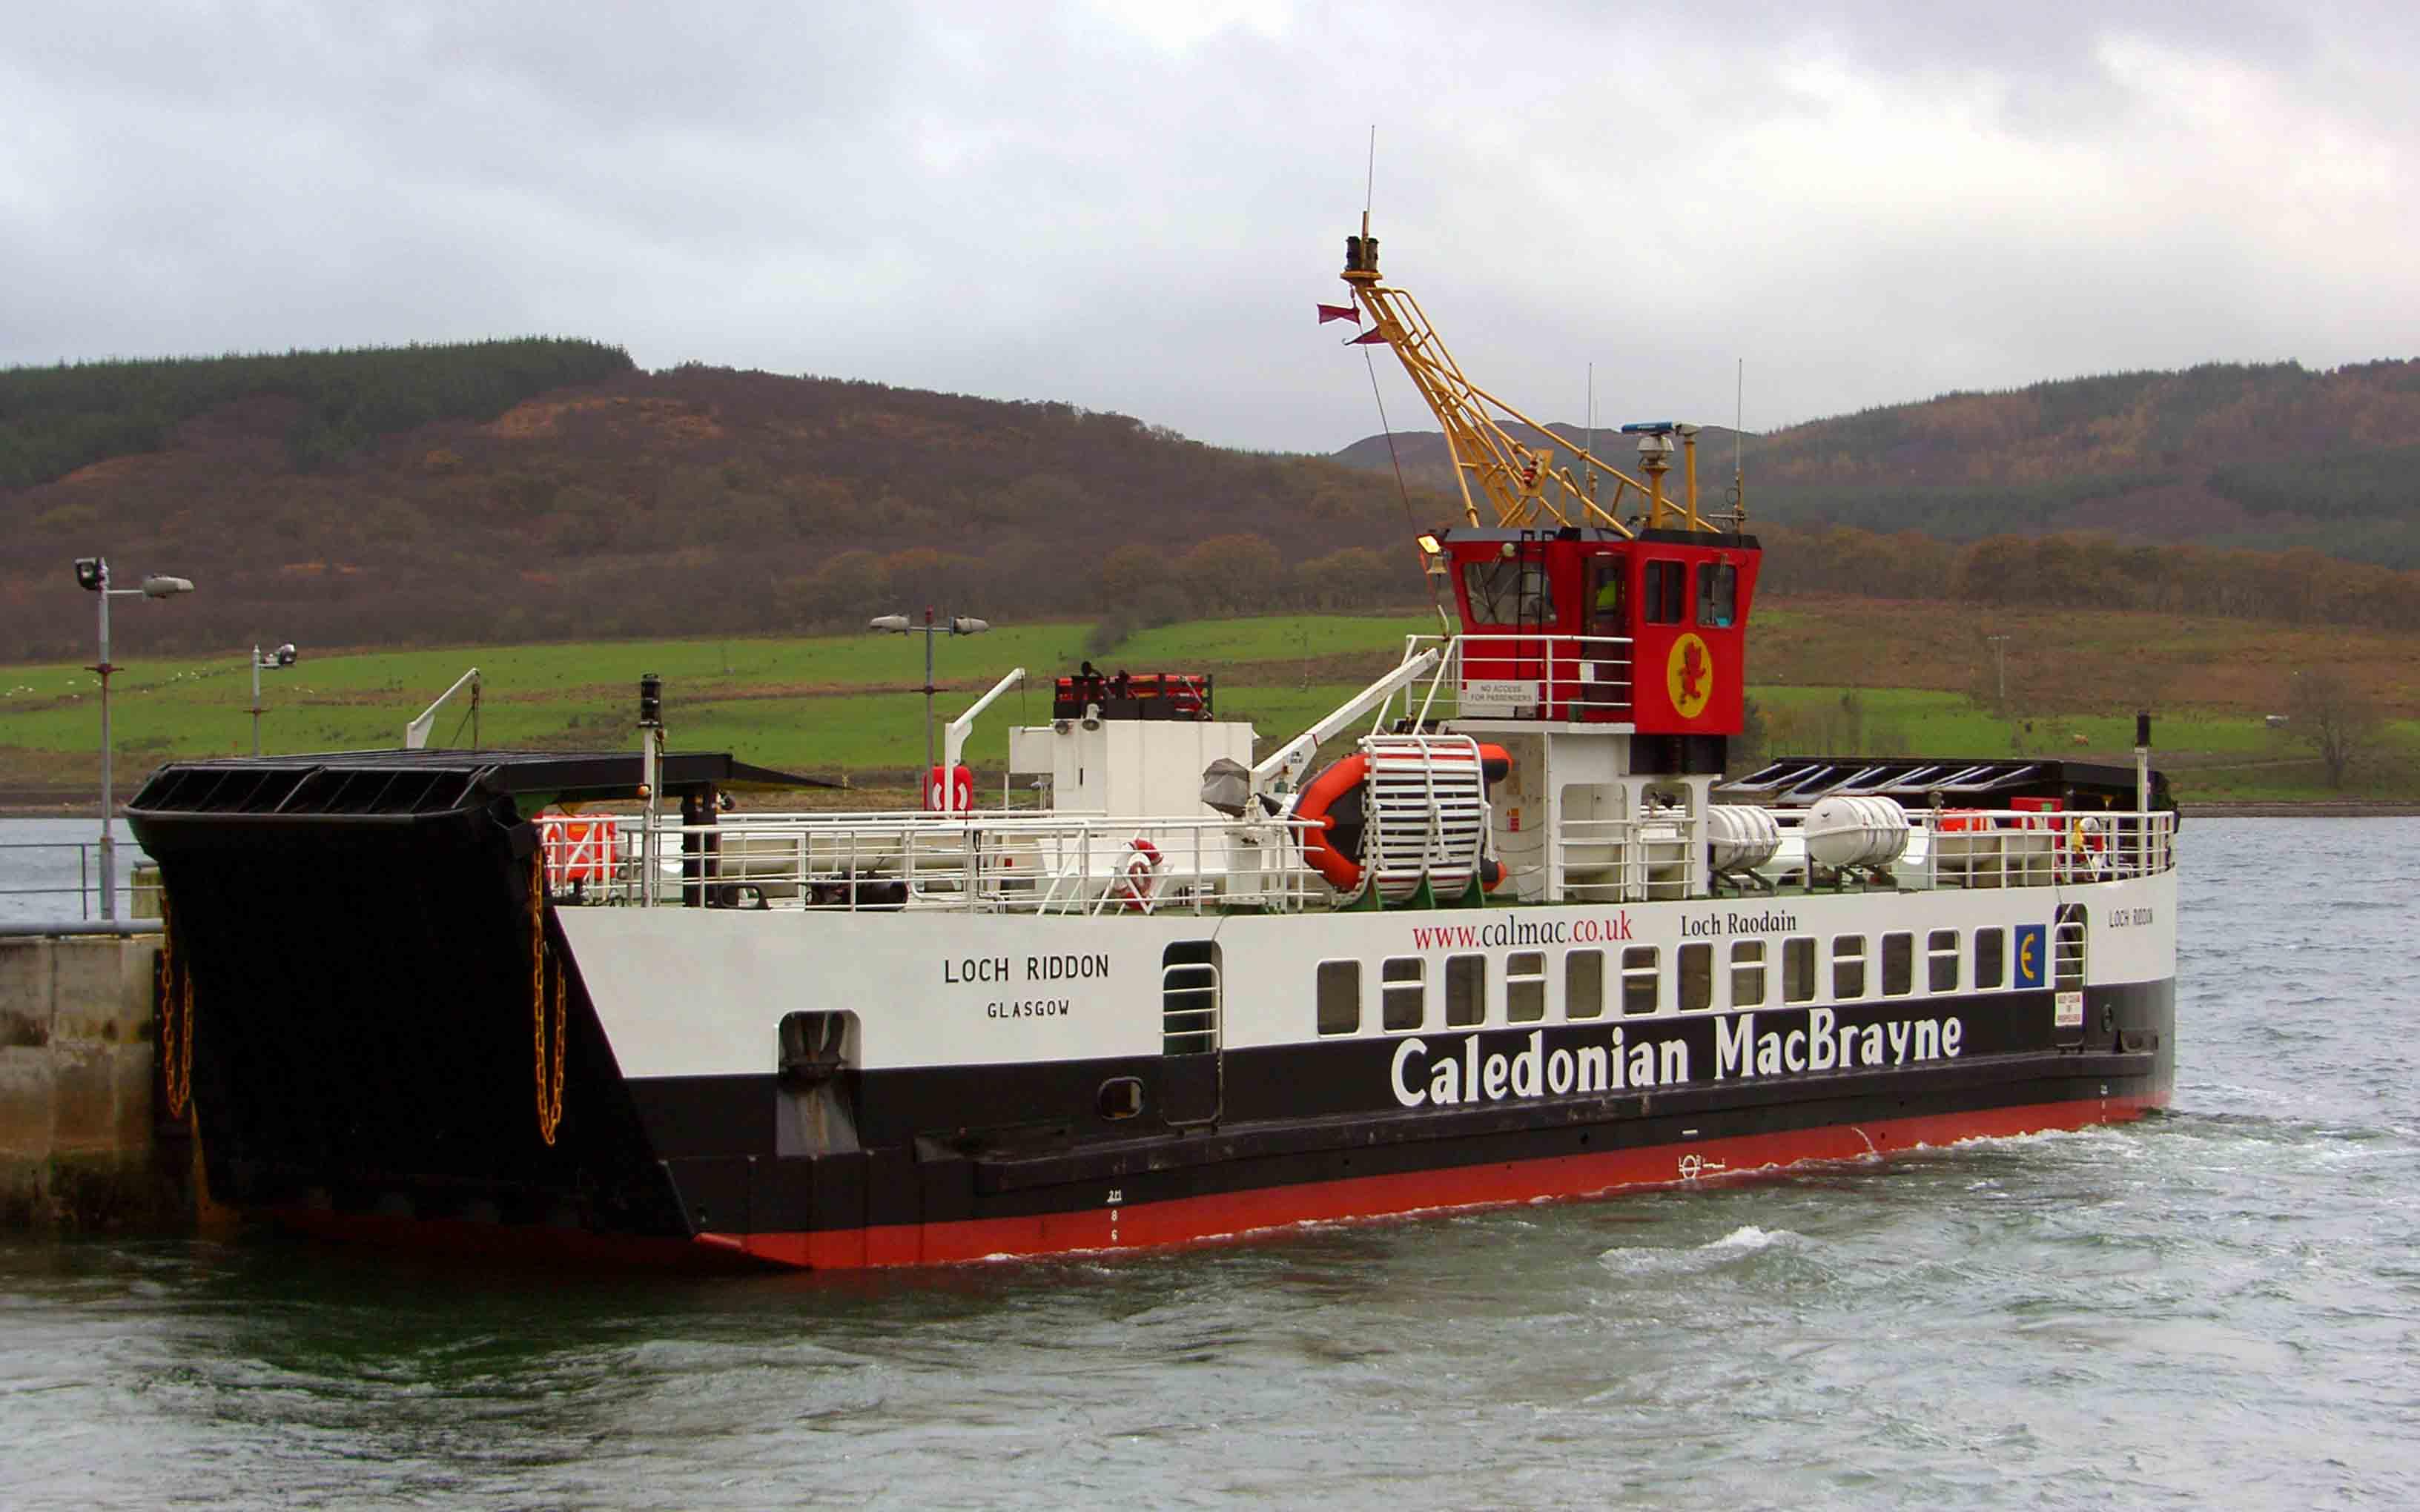 Loch Riddon at Colintraive (Ships of CalMac)